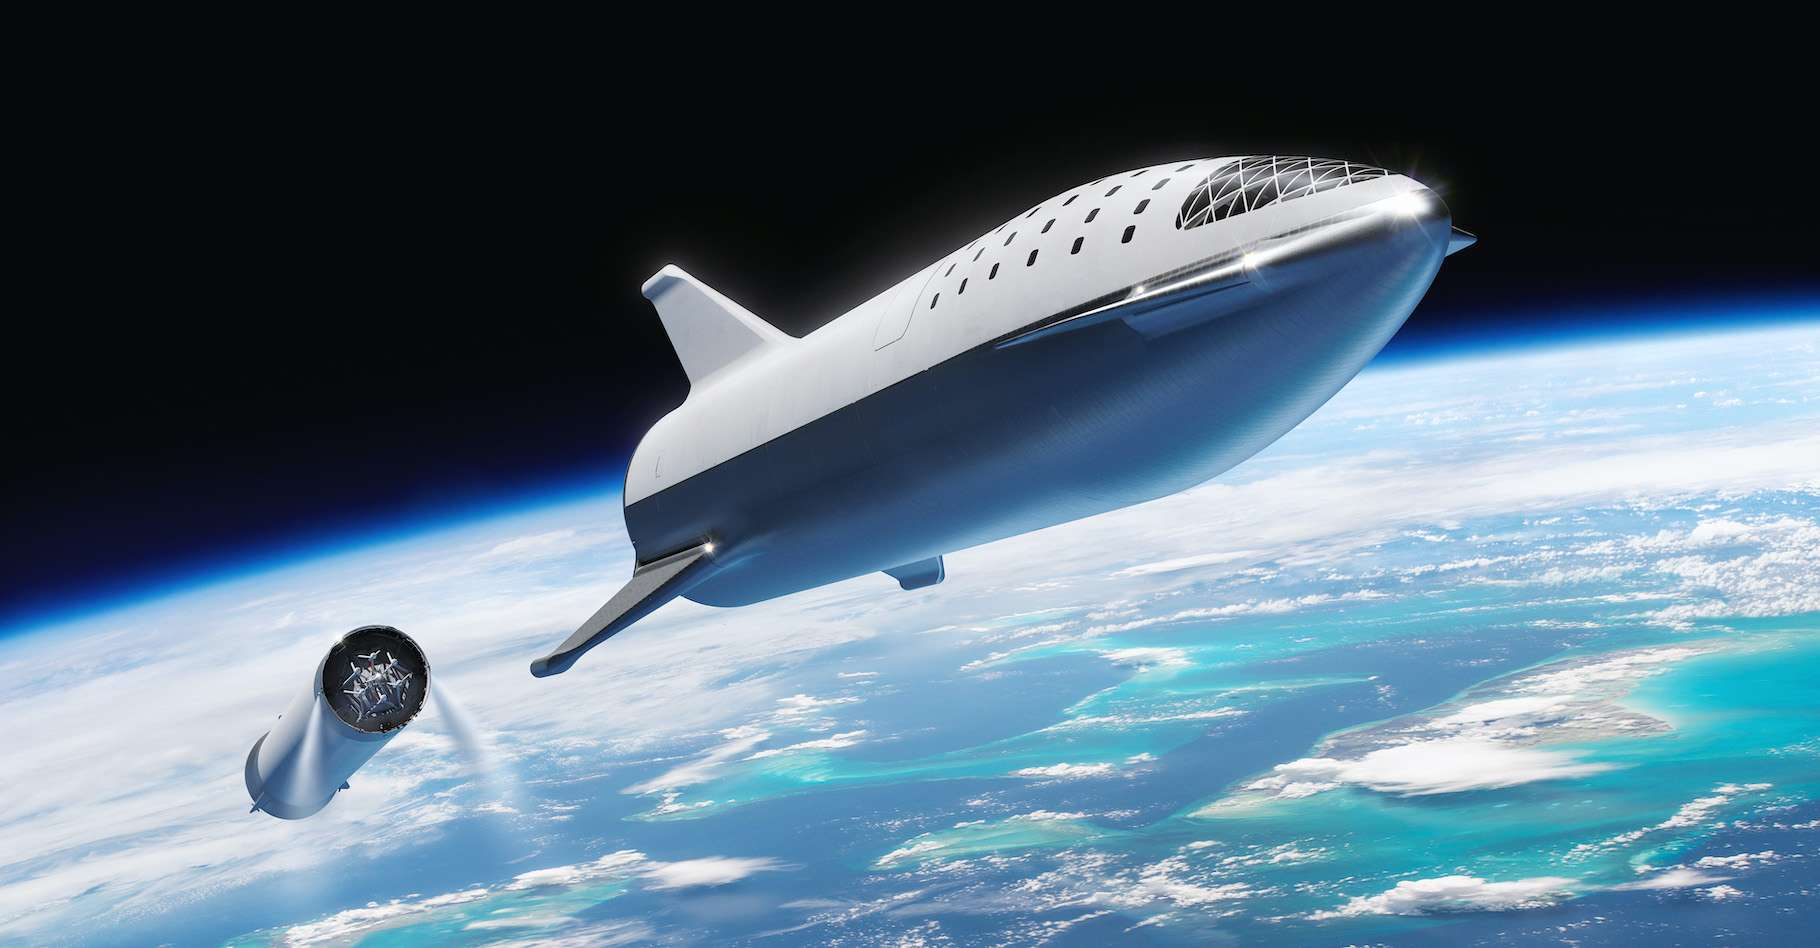 Starship : le prototype a explosé pendant un test